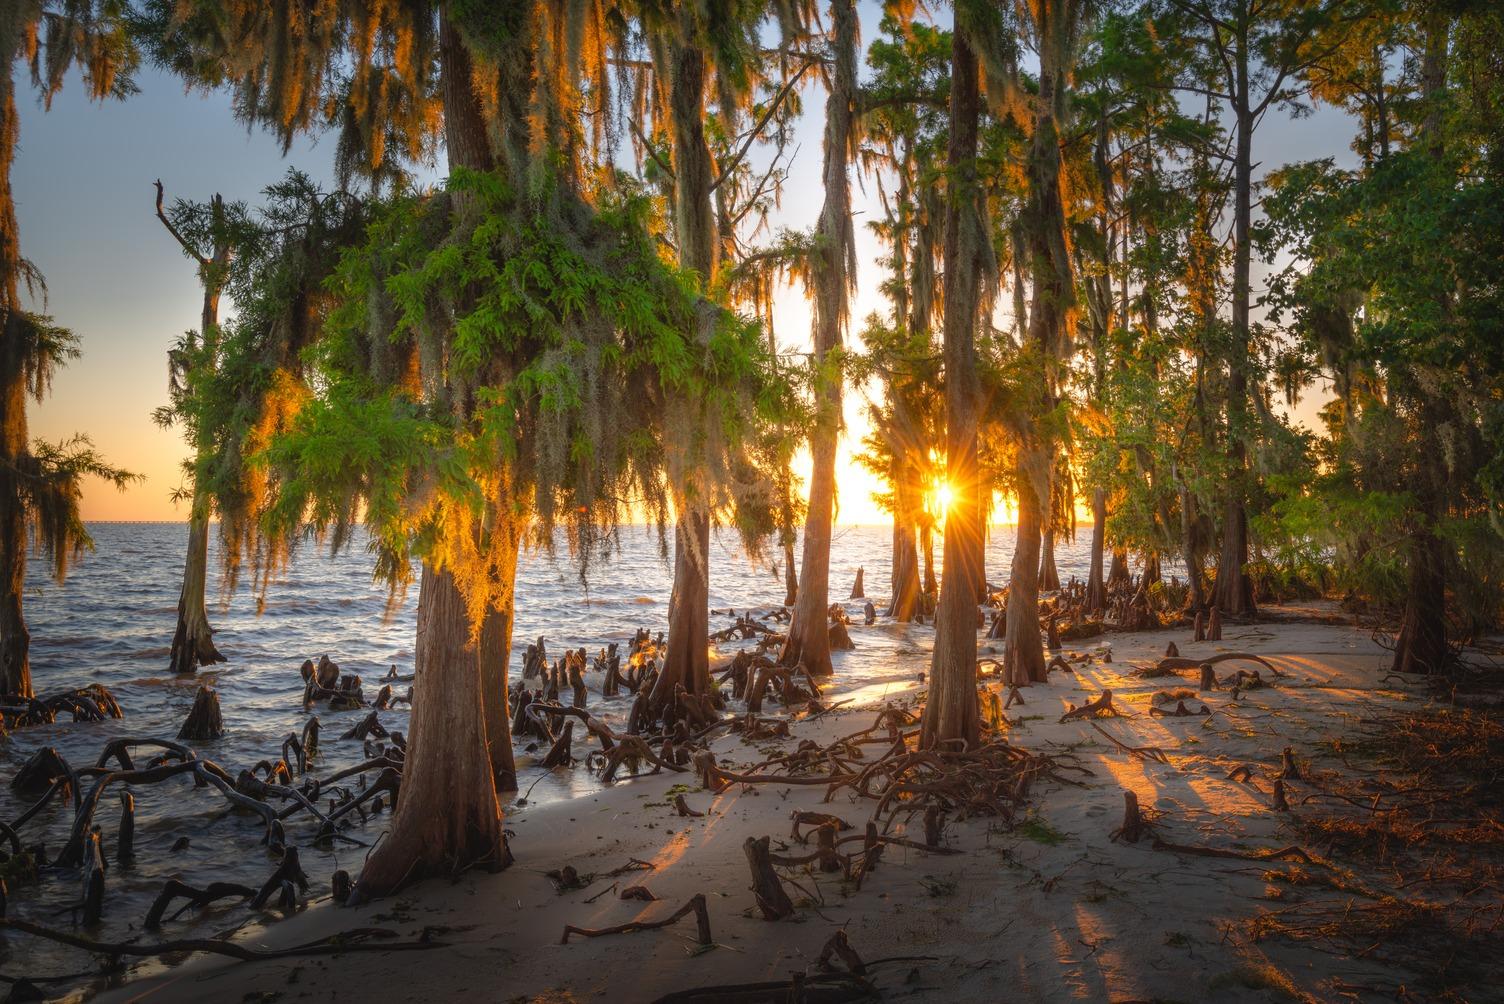 fountainebleau state park louisiana